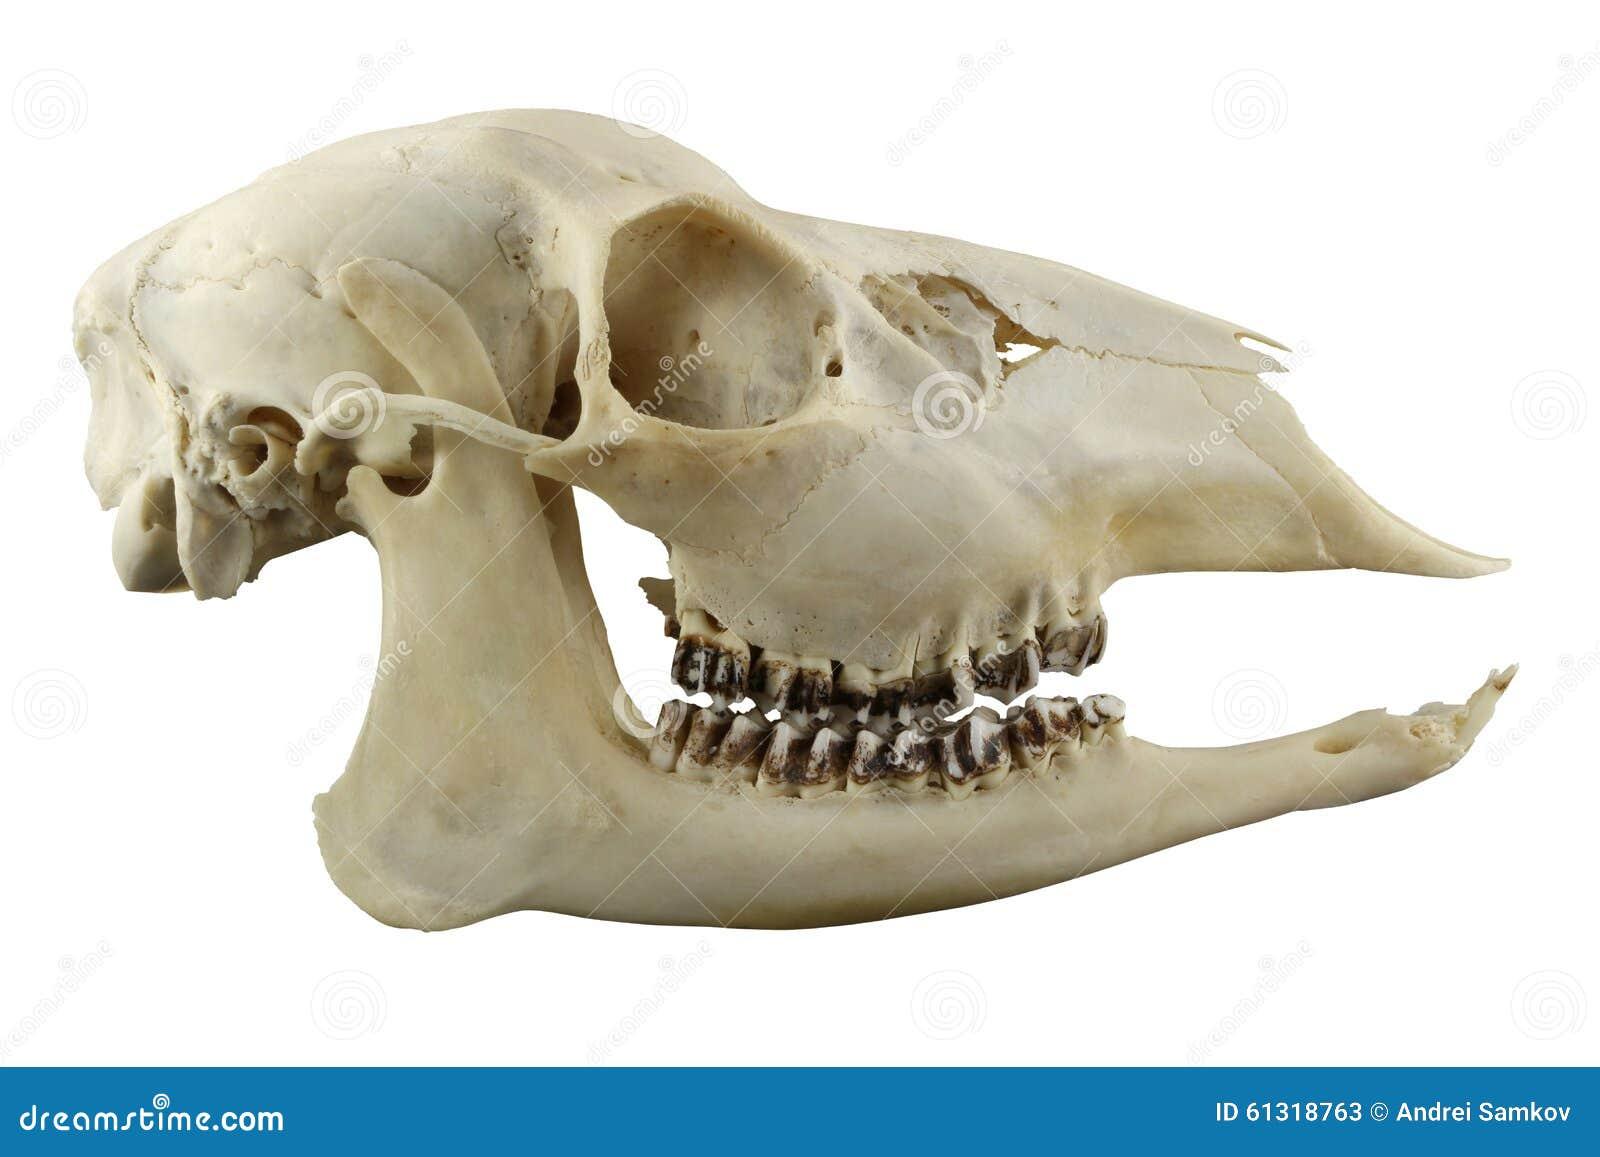 Hornless Roe Deer Skull On A White Background Stock Image - Image of ...